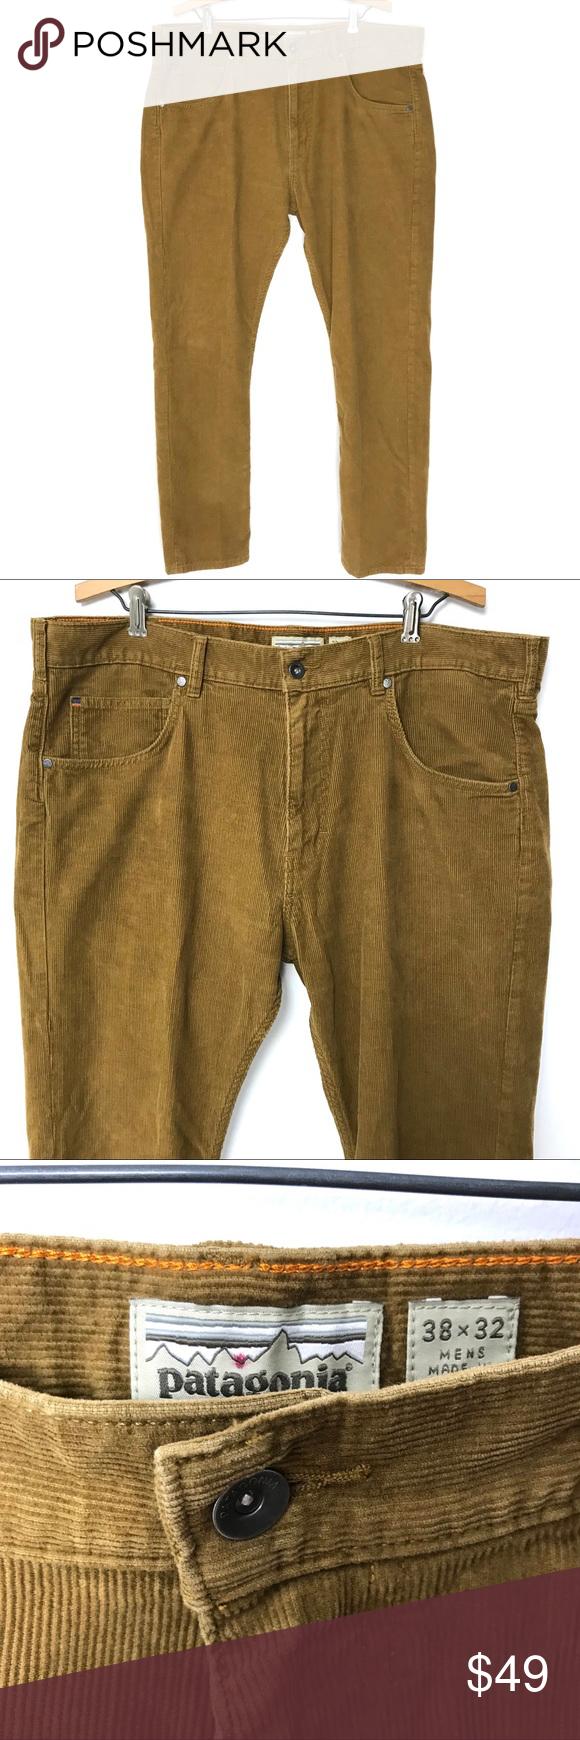 Patagonia 38x32 Iron Clad Organic Corduroy Pants Corduroy Pants Pants Patagonia Pants